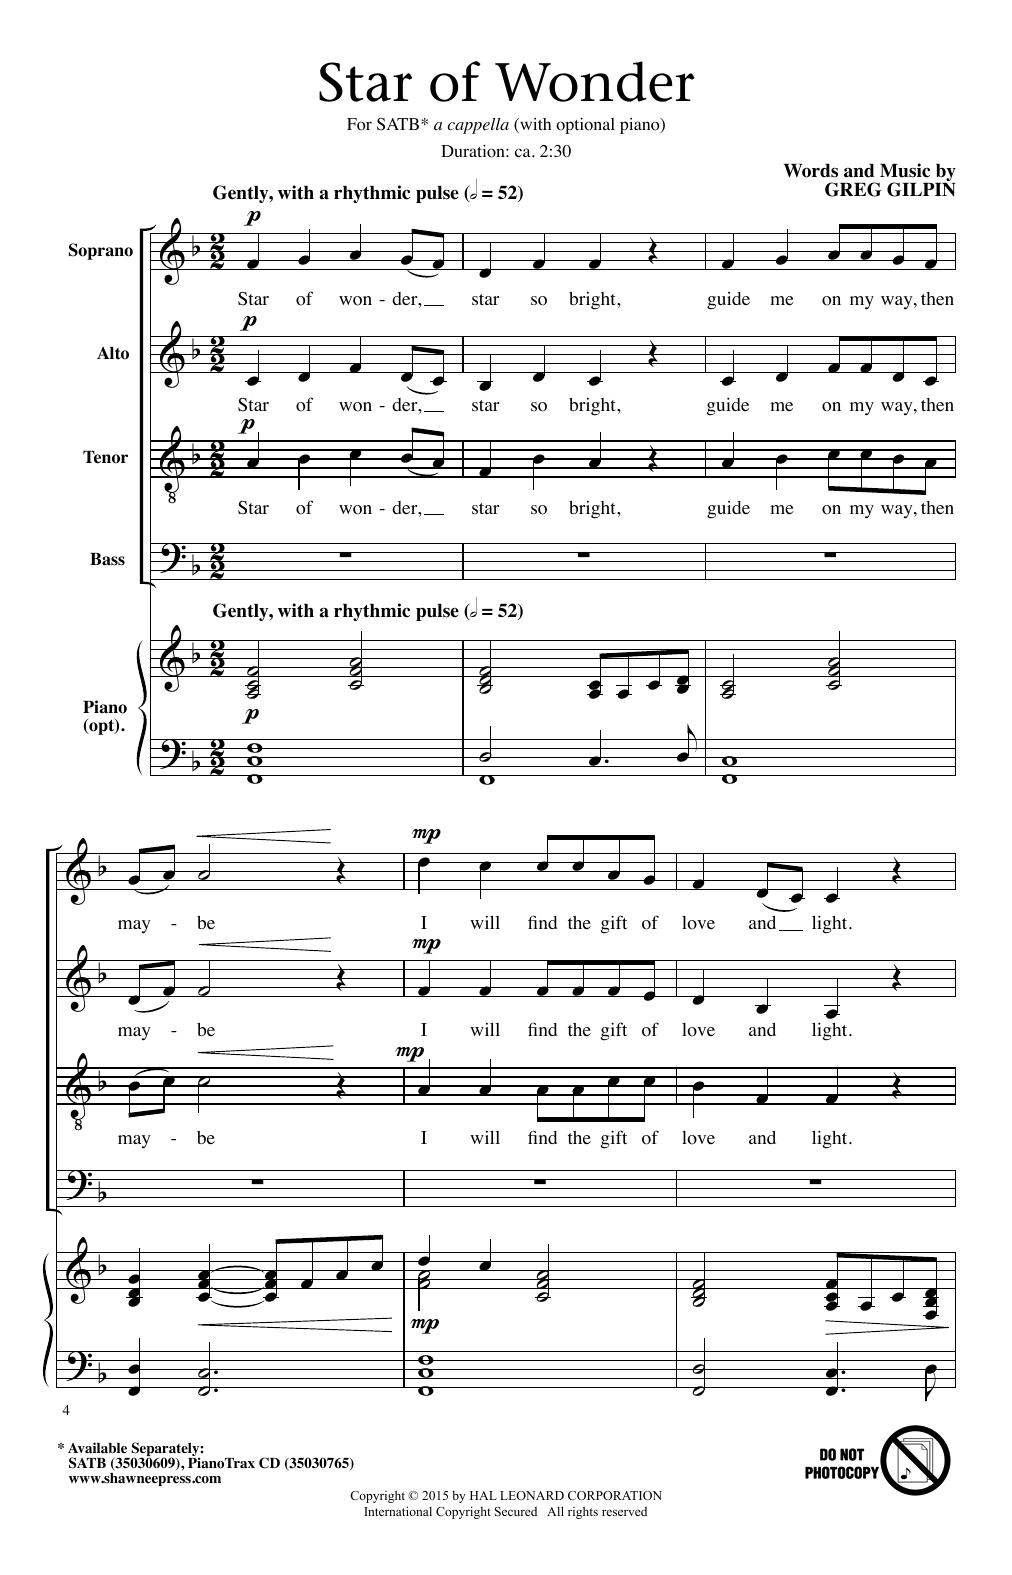 Greg Gilpin Star Of Wonder sheet music notes and chords. Download Printable PDF.